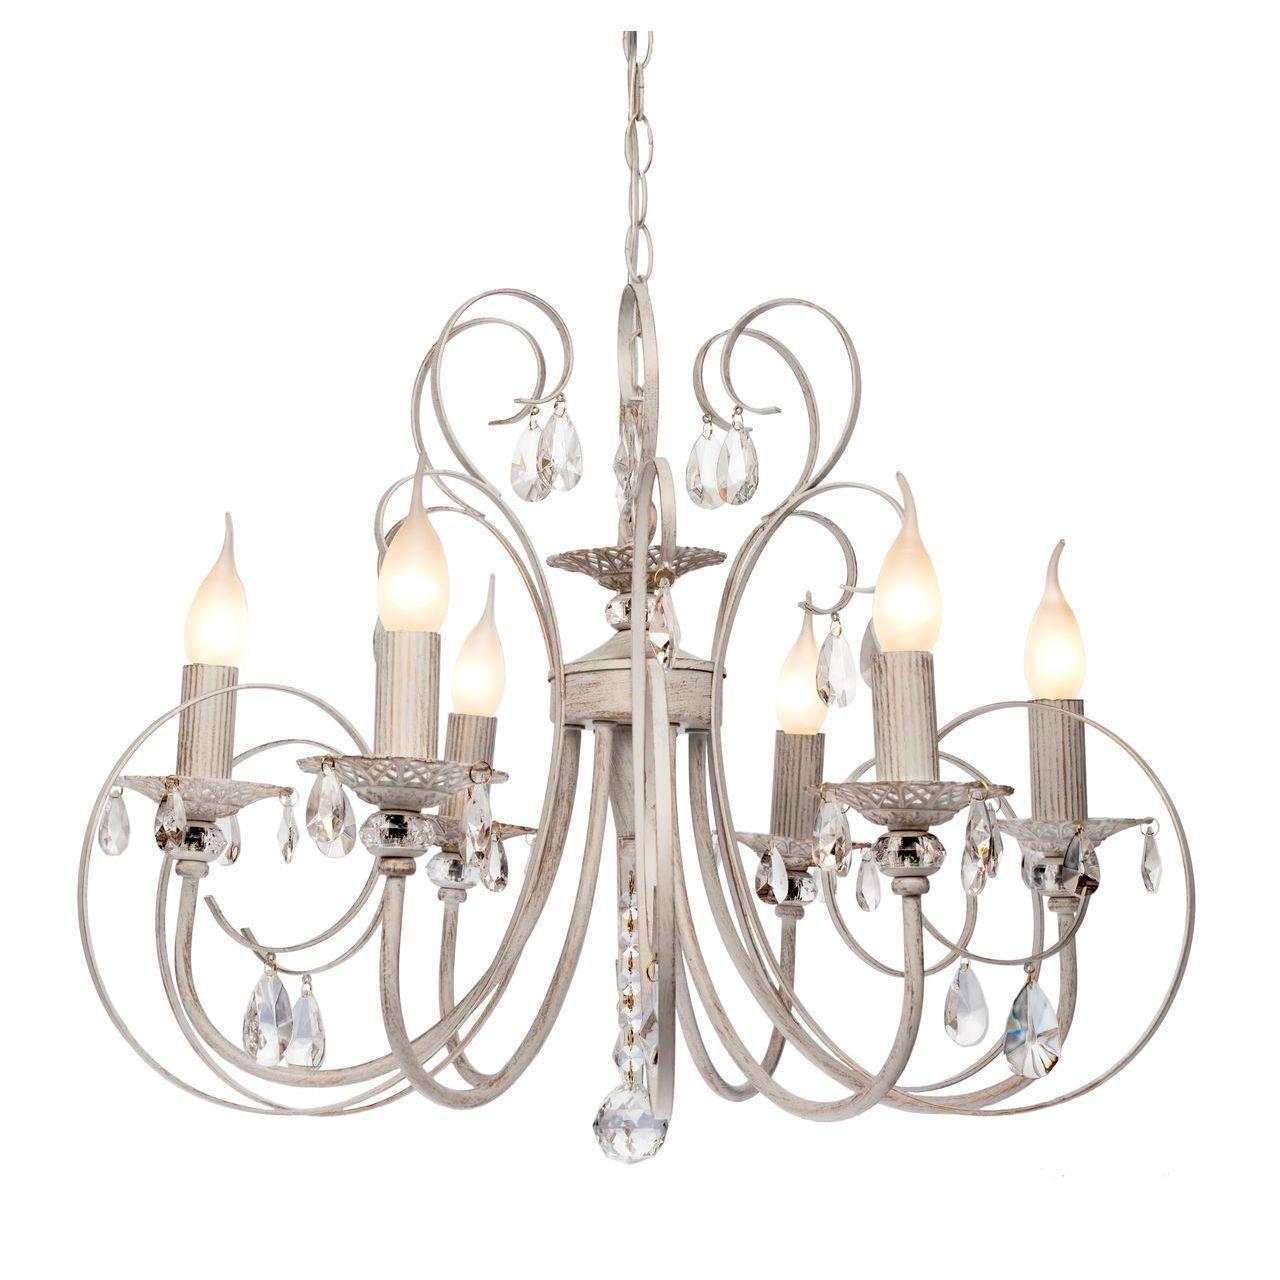 Люстра Silver Light Vienna 155.51.6 подвесная silver light люстра silver light vienna 155 53 8 03tps78